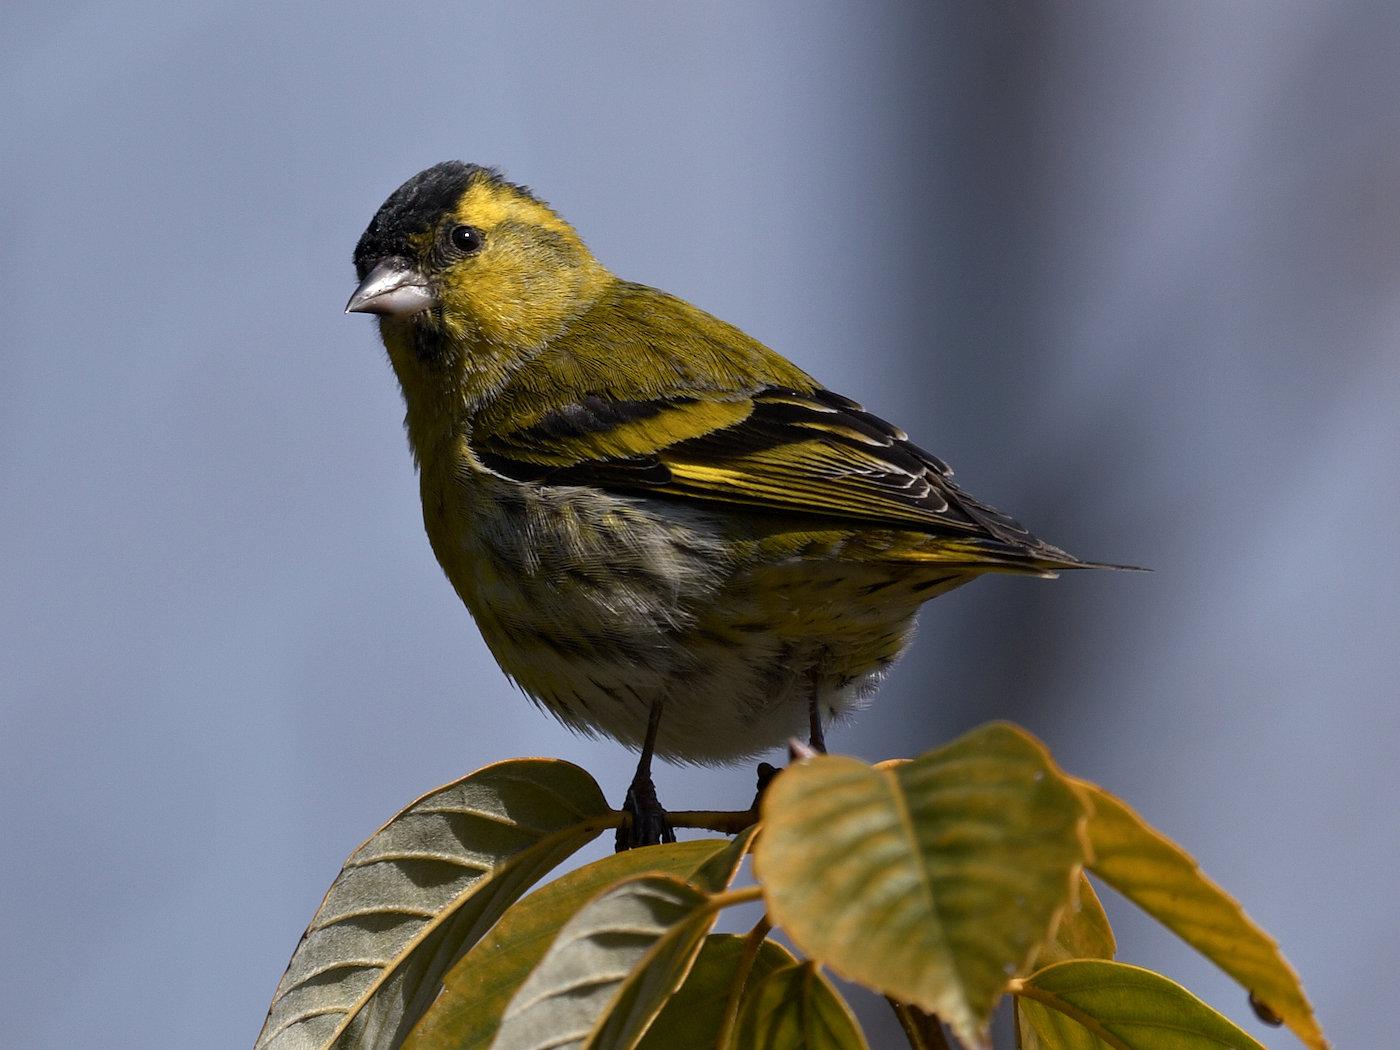 BORG50FLで撮影した野鳥・マヒワの写真画像